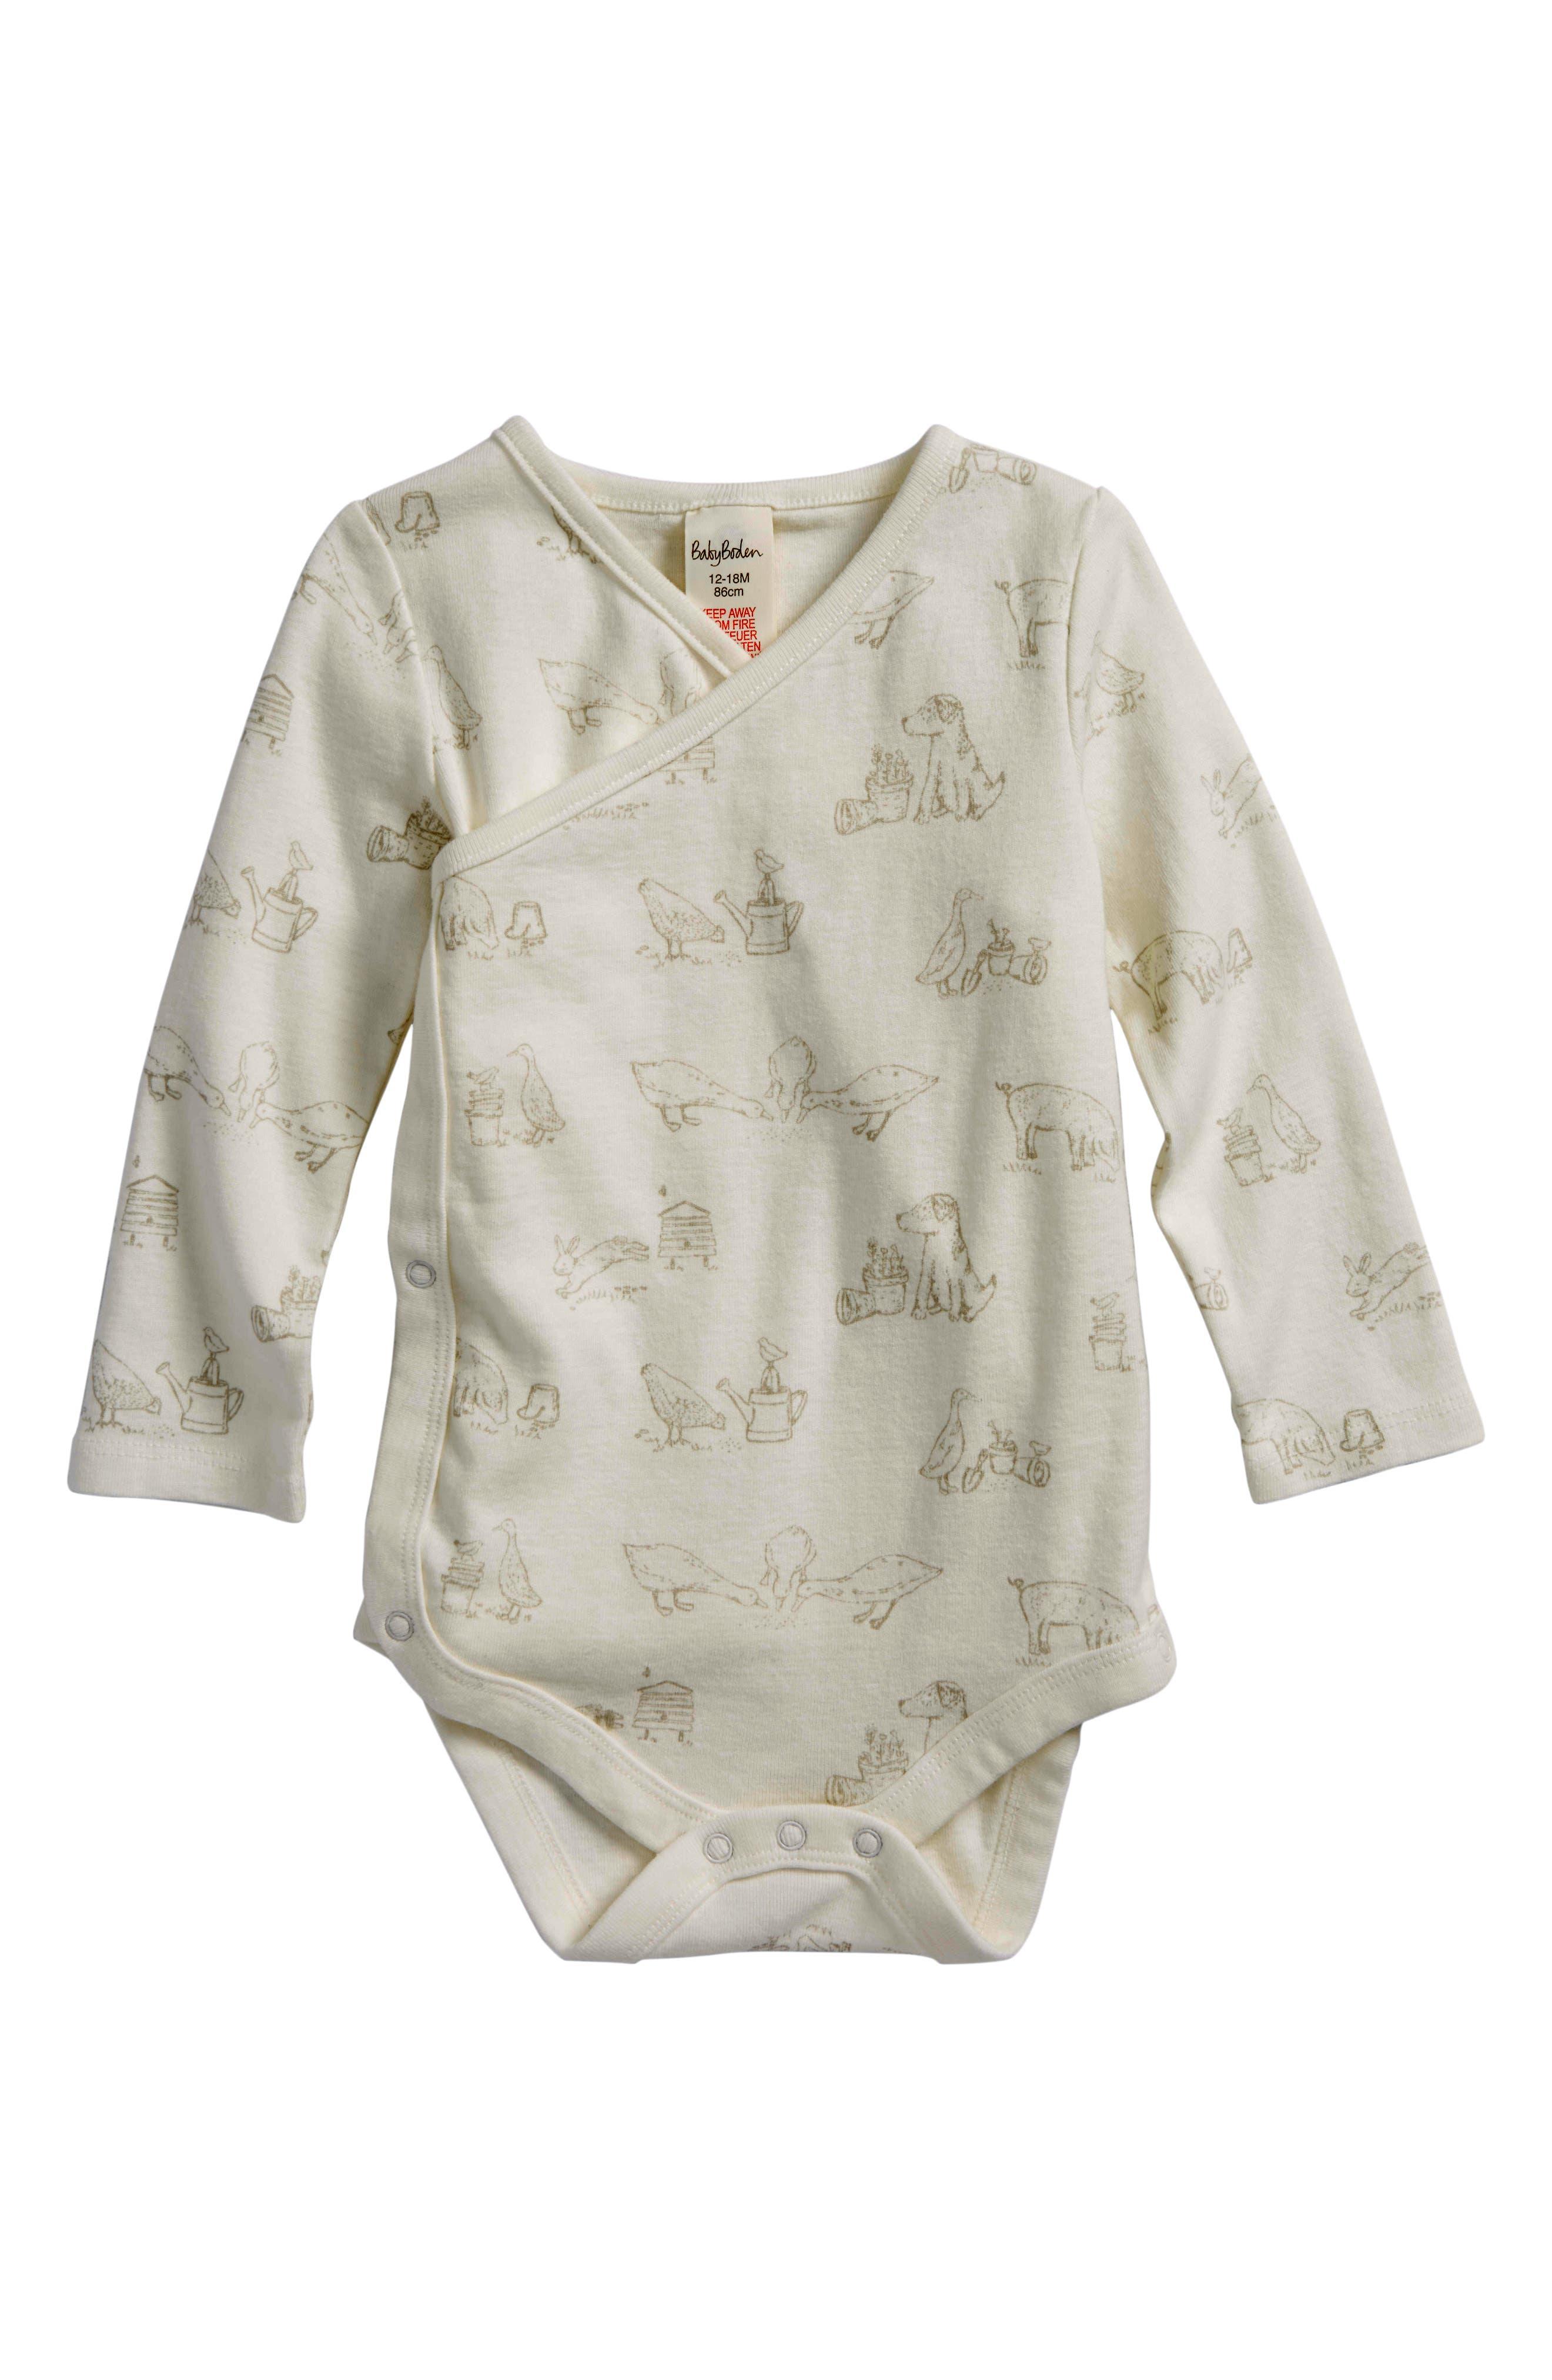 MINI BODEN, Farmyard Organic Cotton Wrap Bodysuit, Main thumbnail 1, color, SHALE GREY